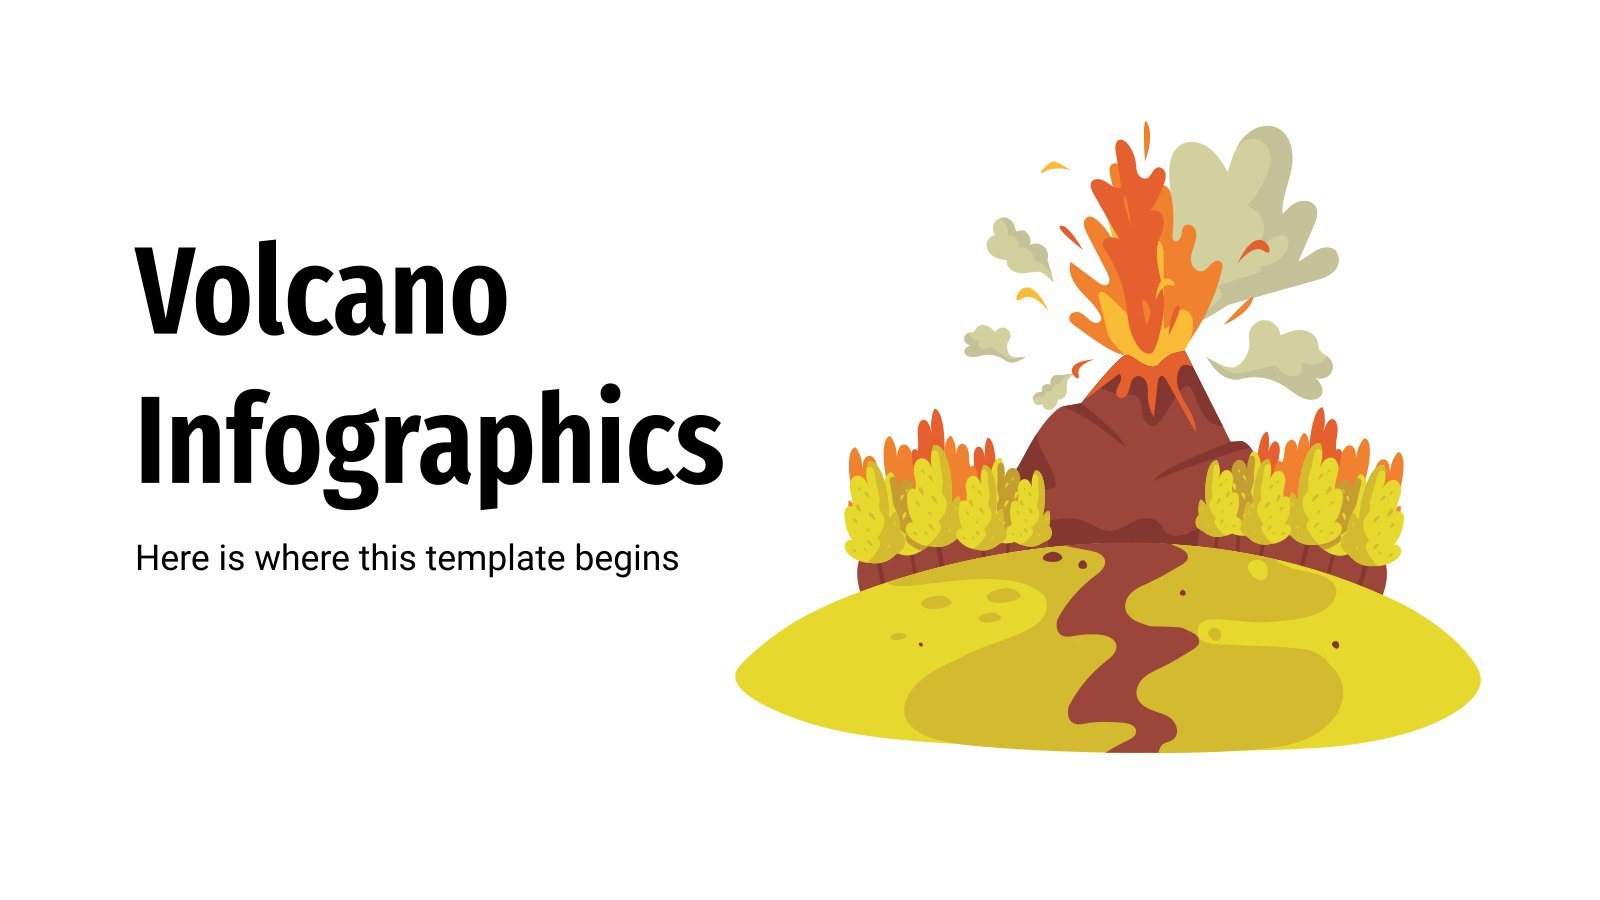 Volcano Infographics presentation template